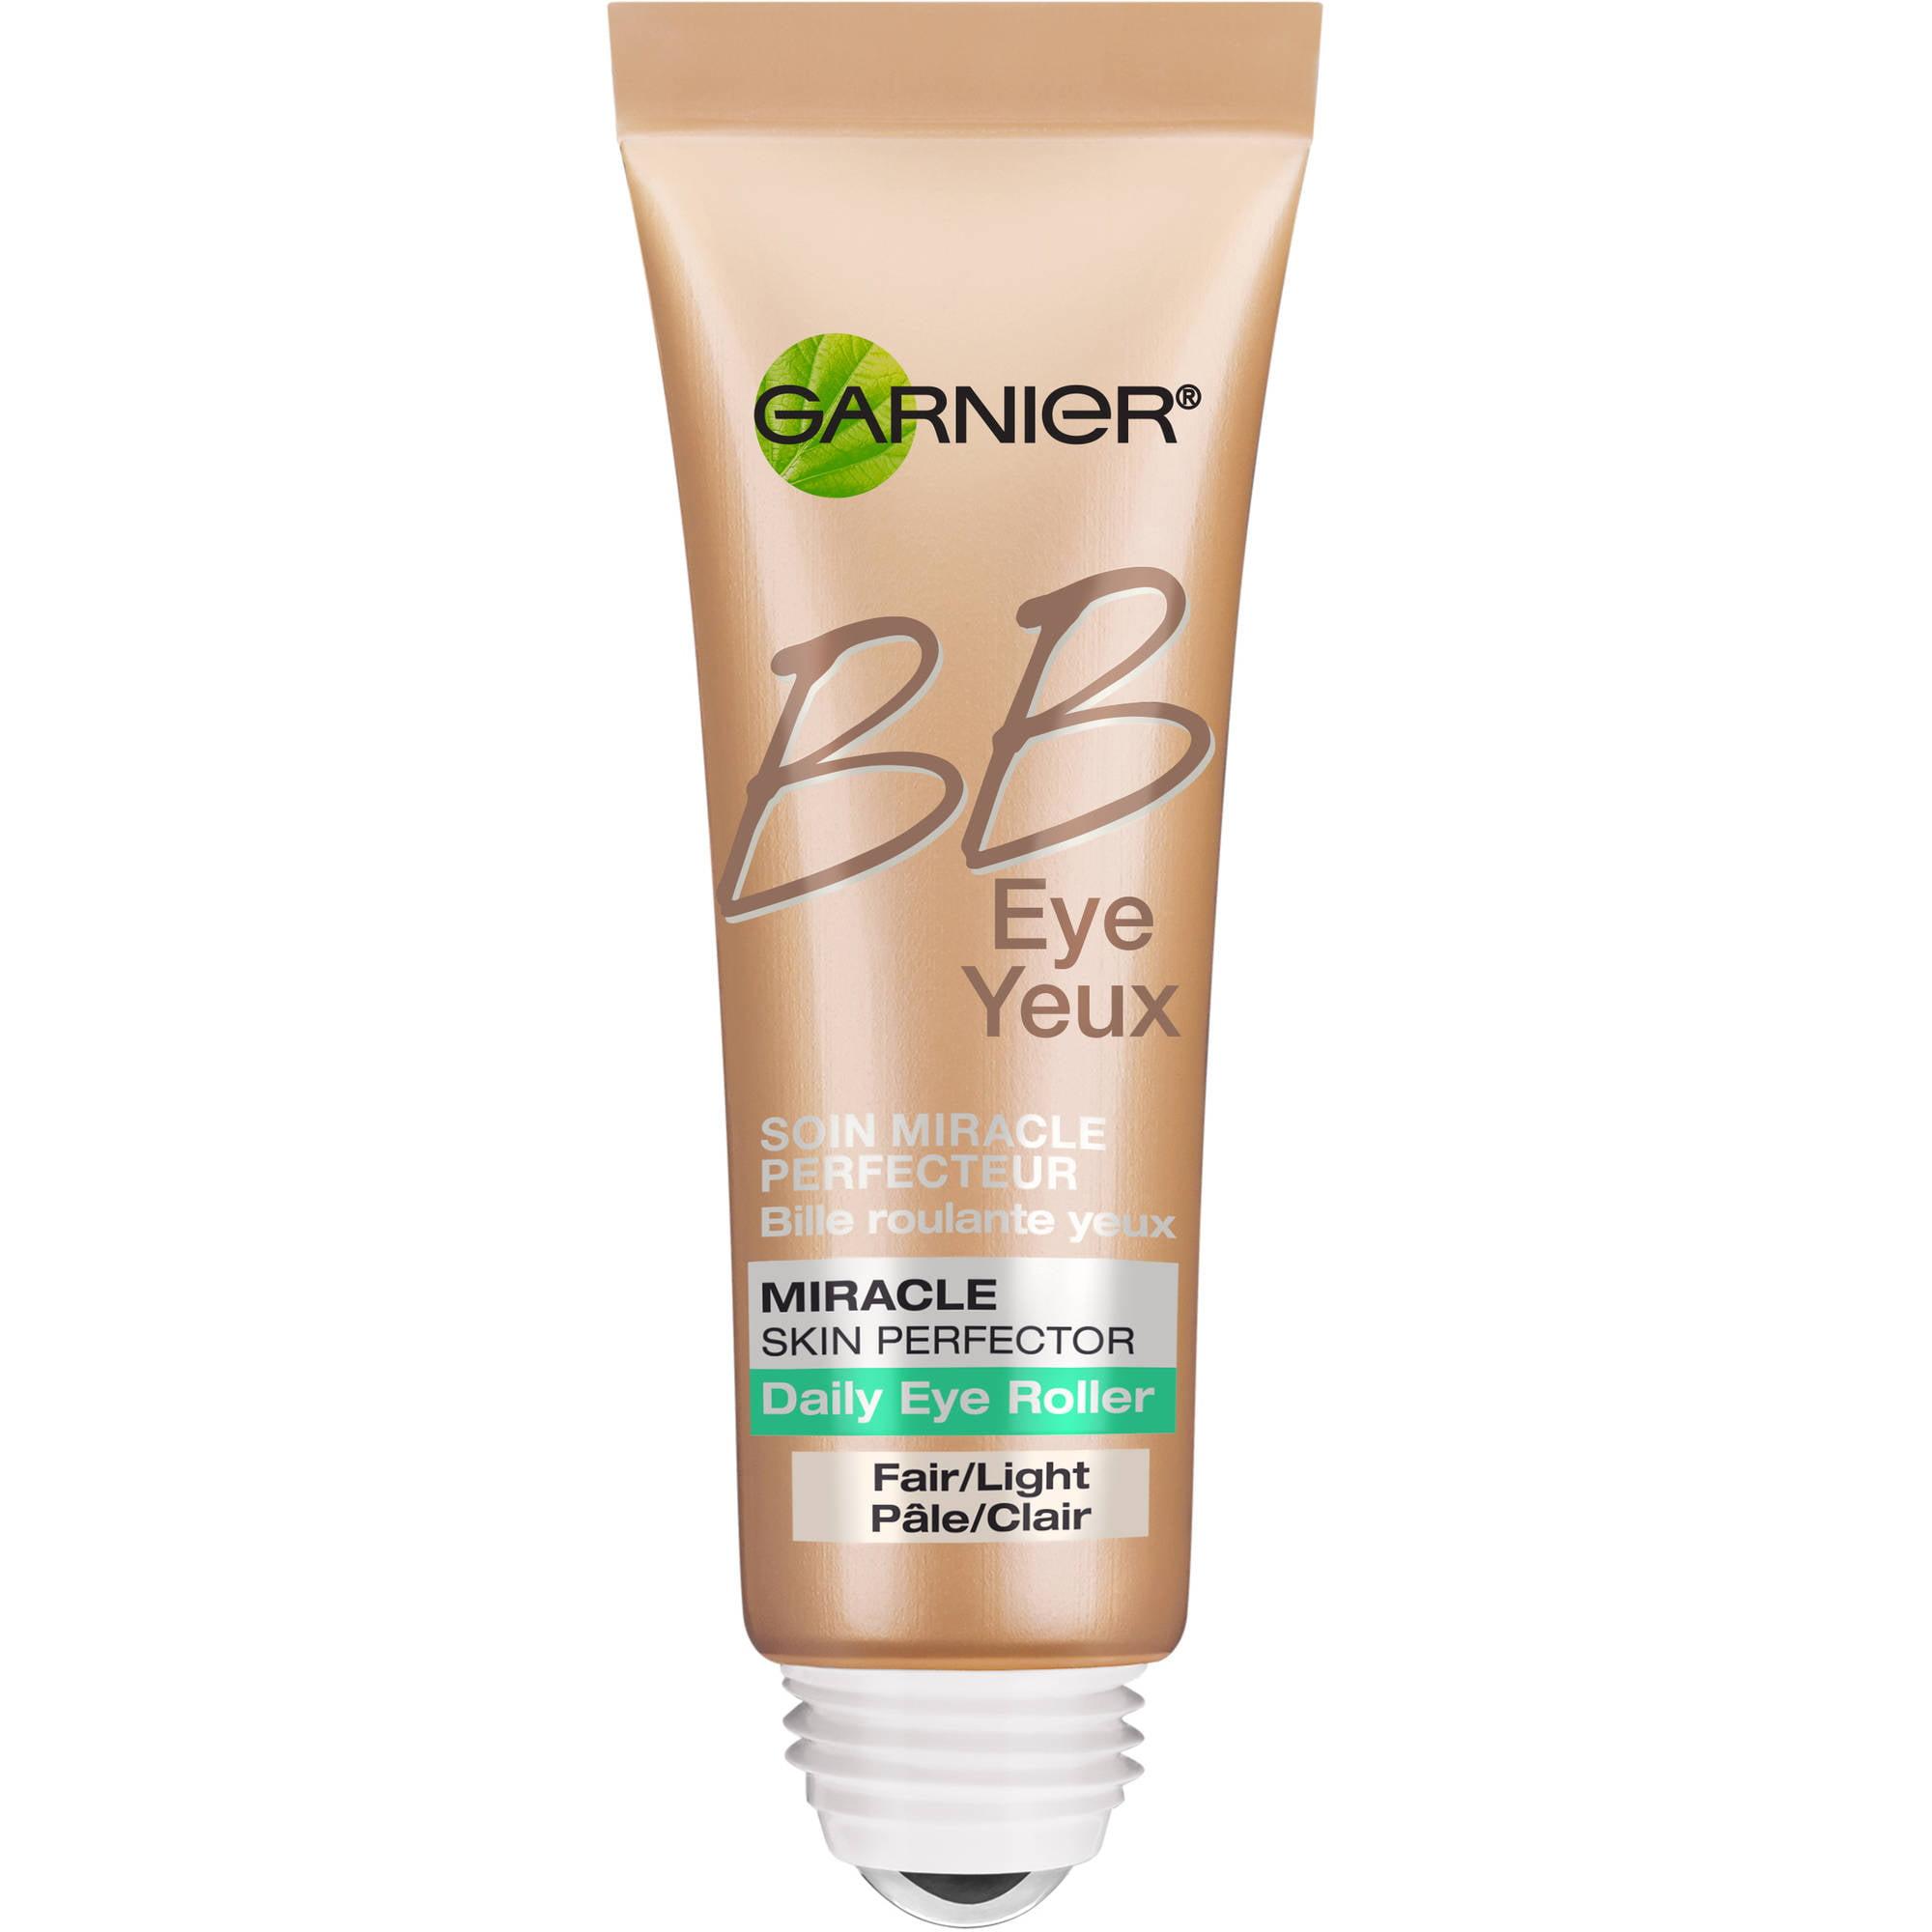 bb cream miracle skin perfector